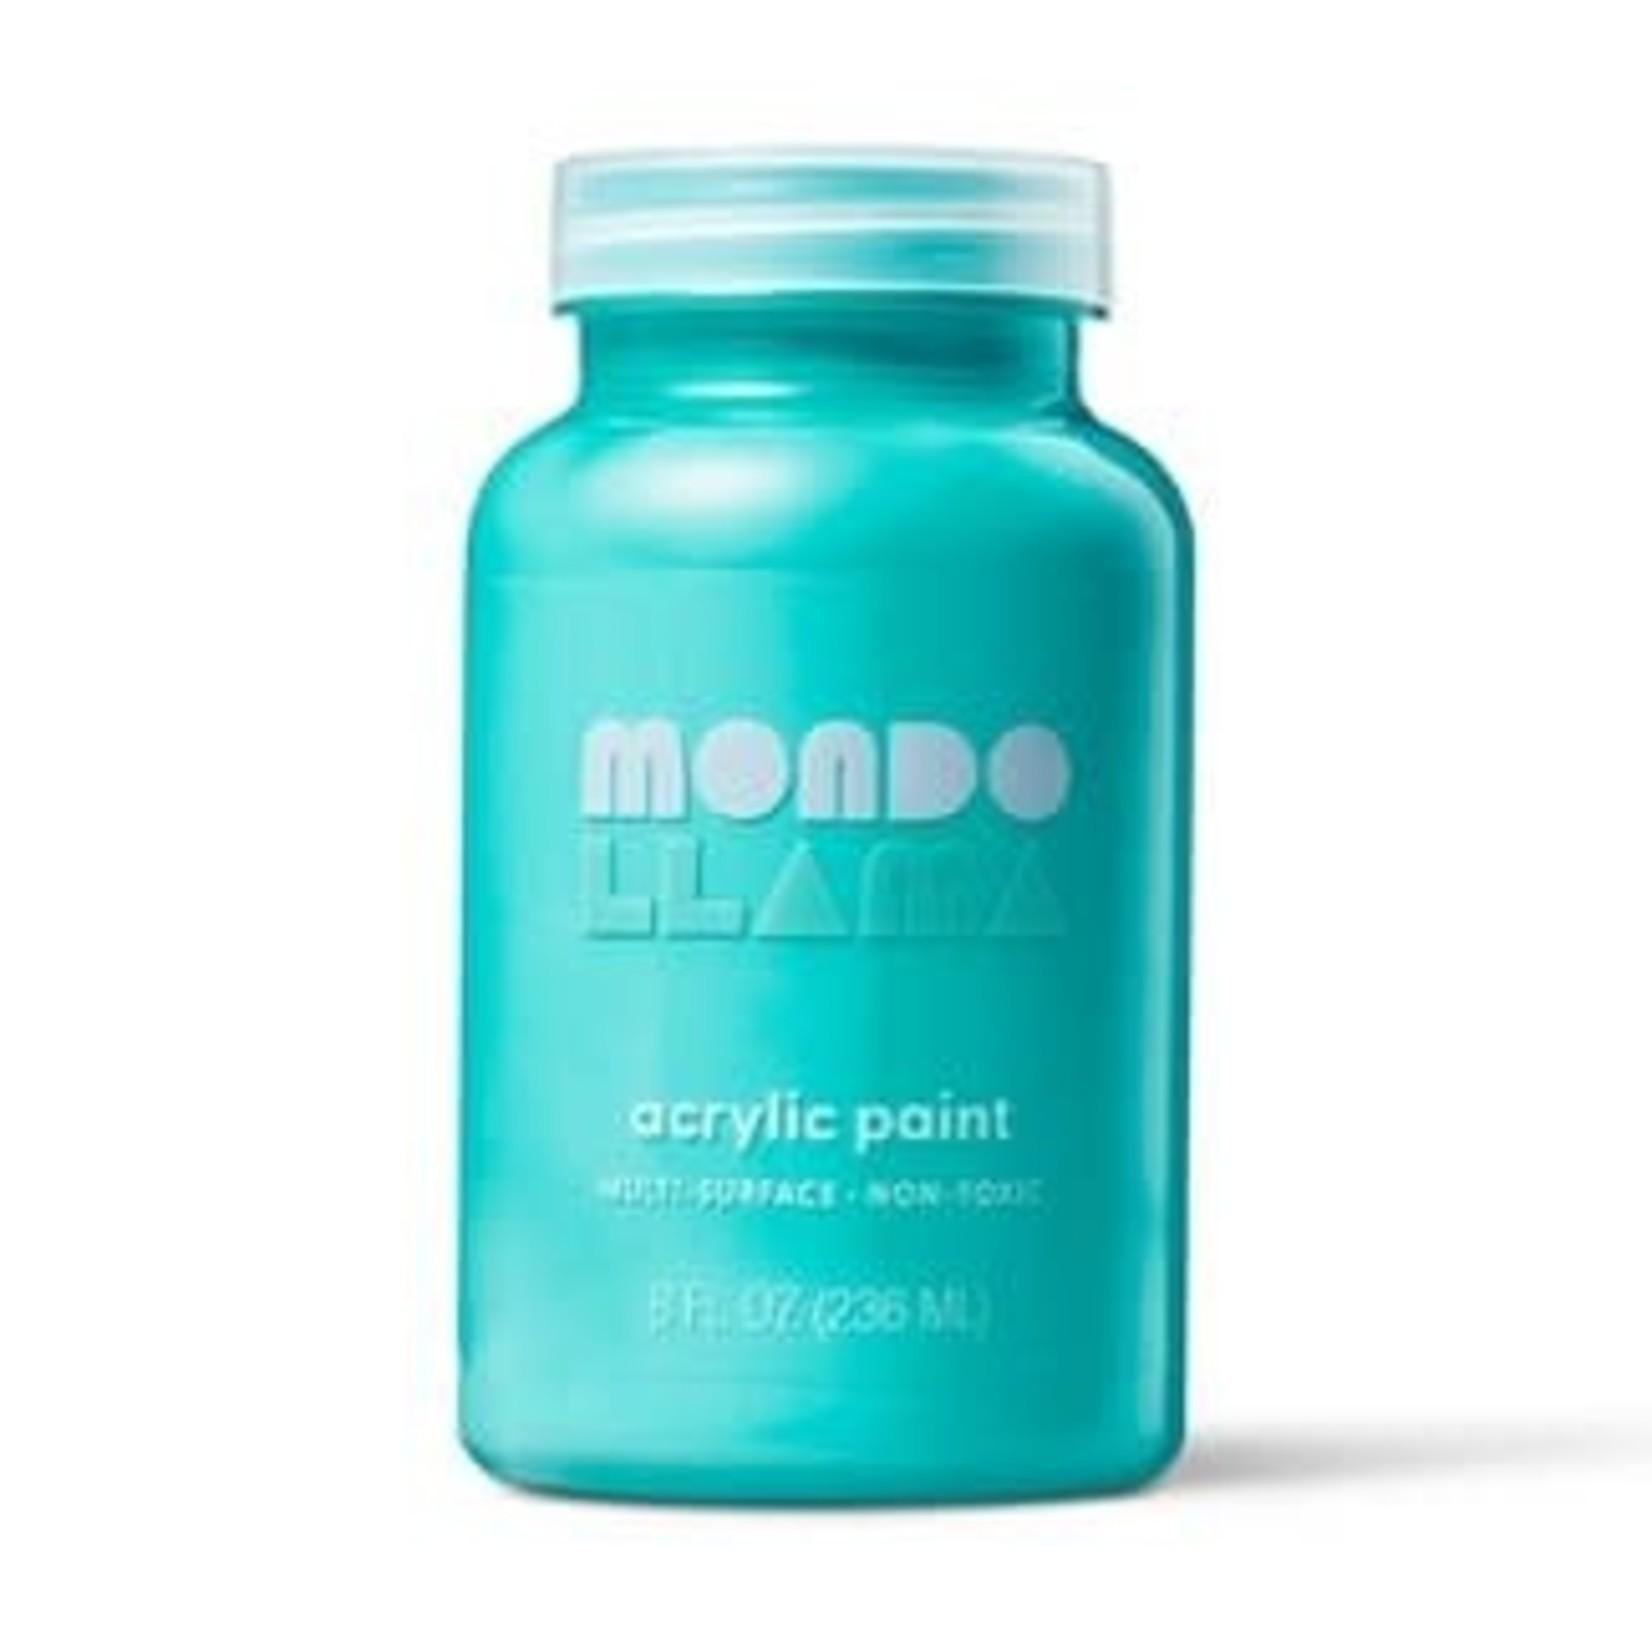 Mondo Lama 8oz Satin Acrylic Paint -Sparkling Pool